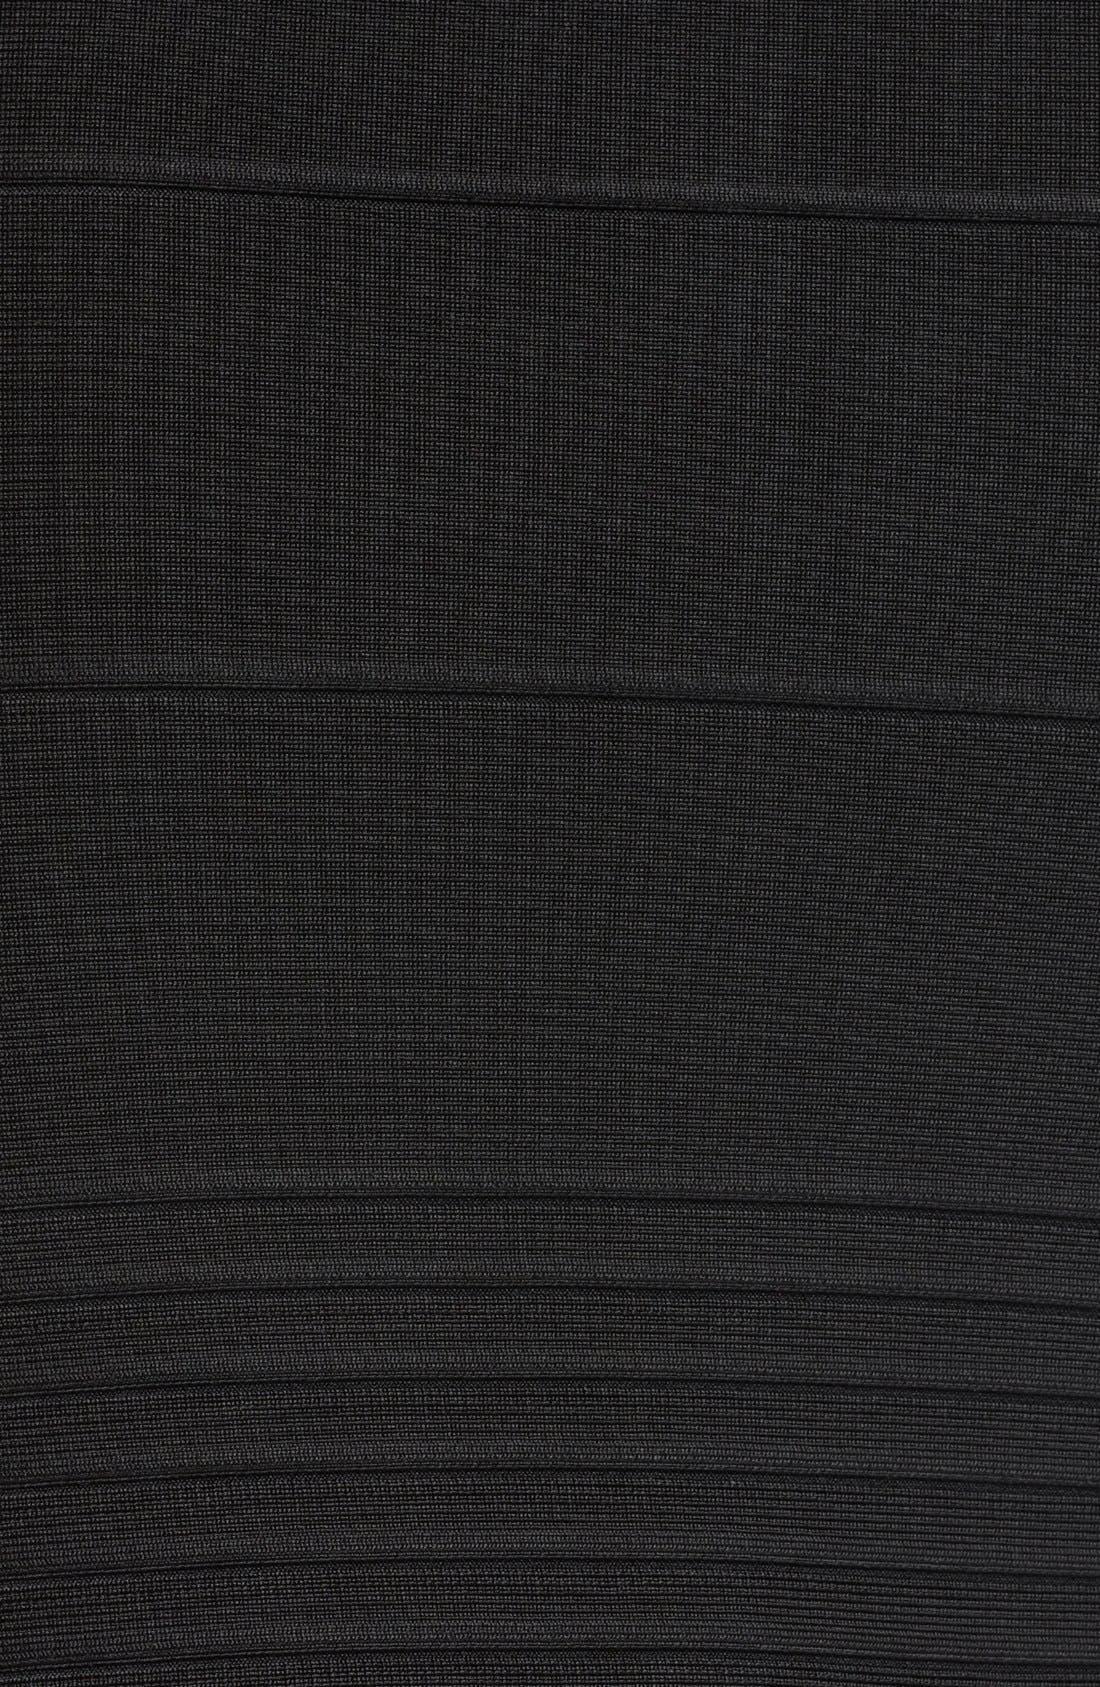 Alternate Image 3  - Herve Leger Strapless Bandage Dress